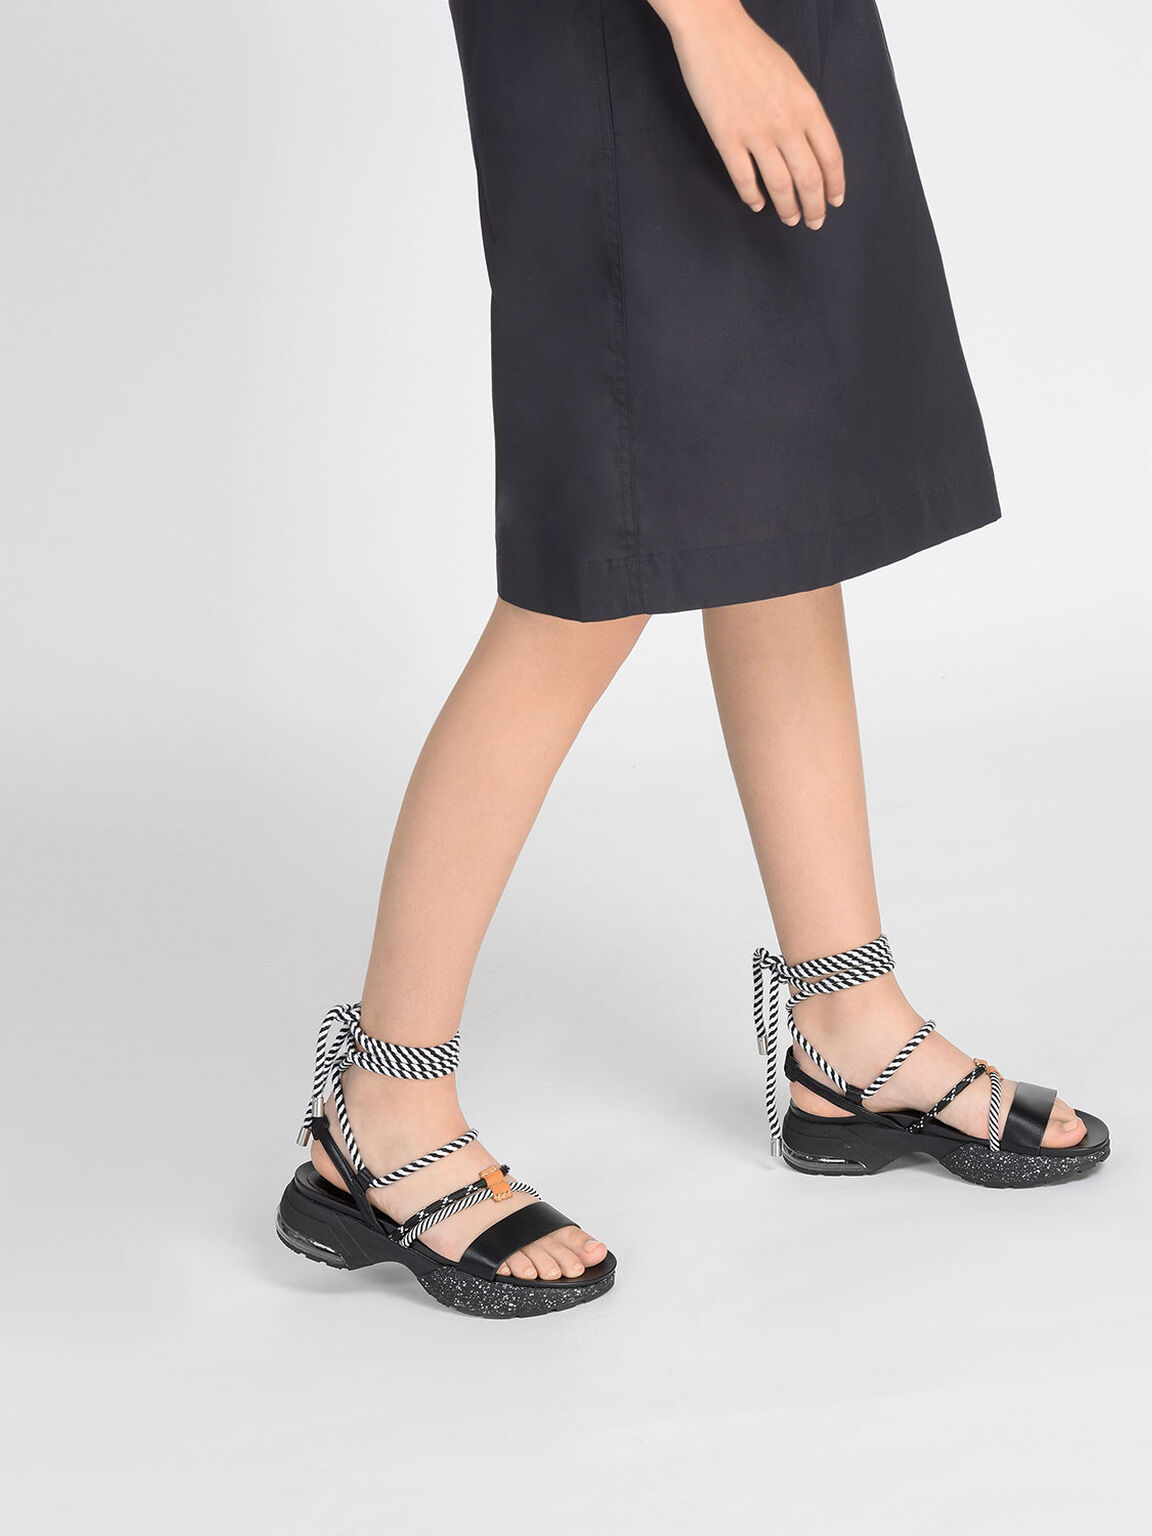 Laced Up Rope Detail Sandals, Black, hi-res